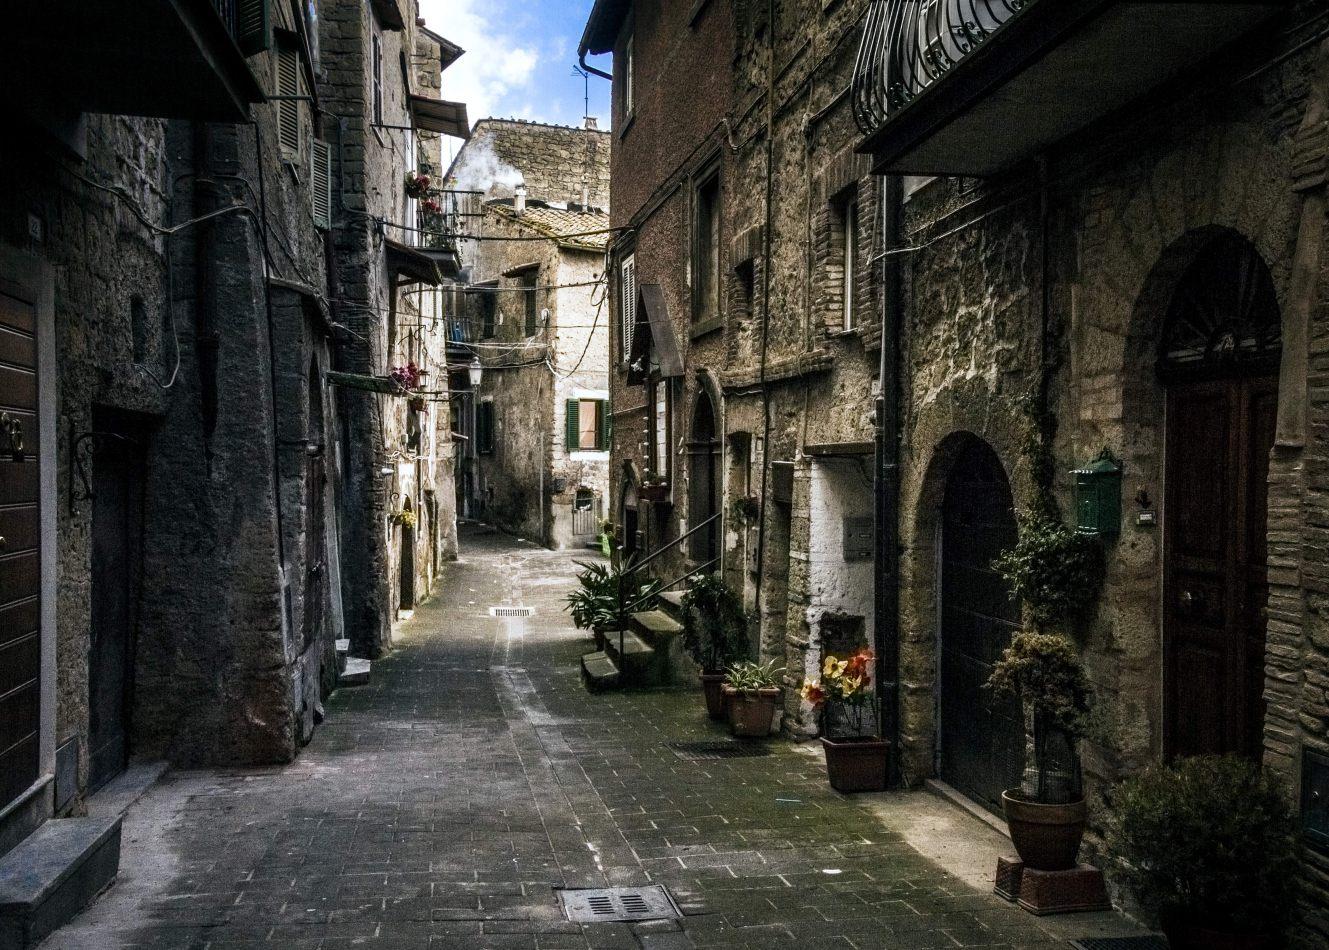 Storvandre: Caprarola